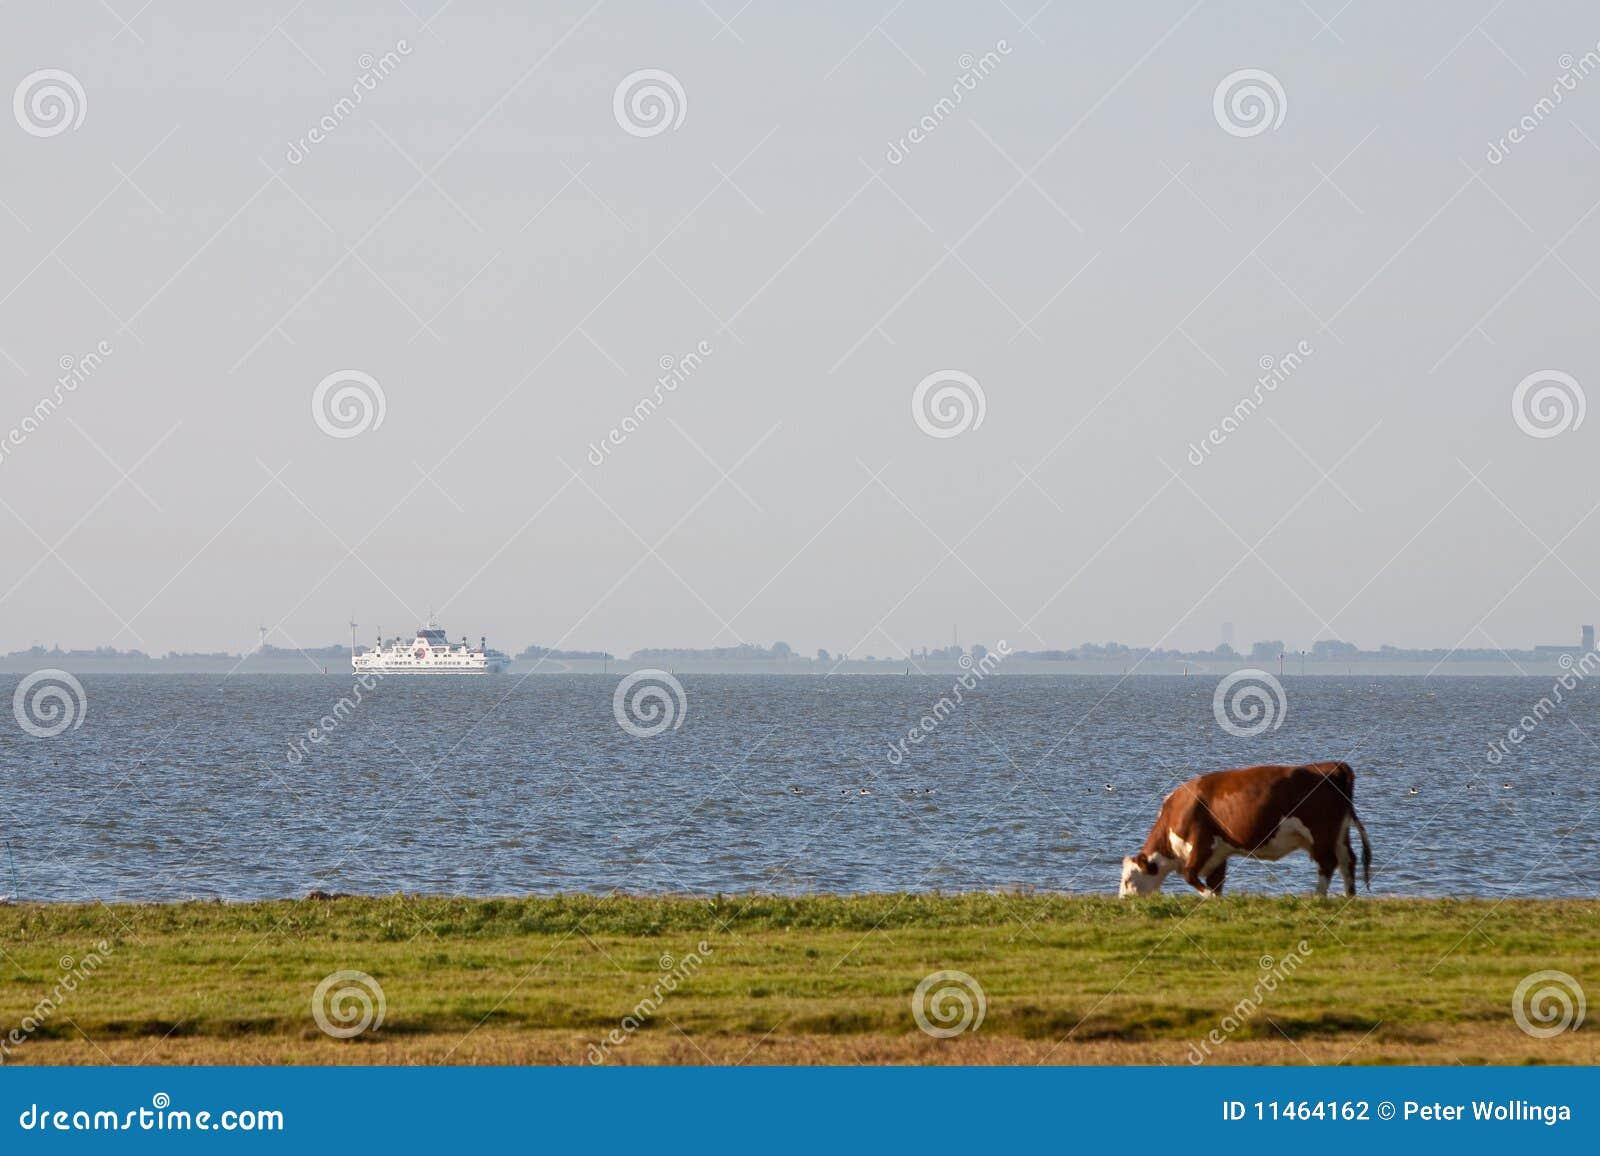 Cow grazing in a farmland near water